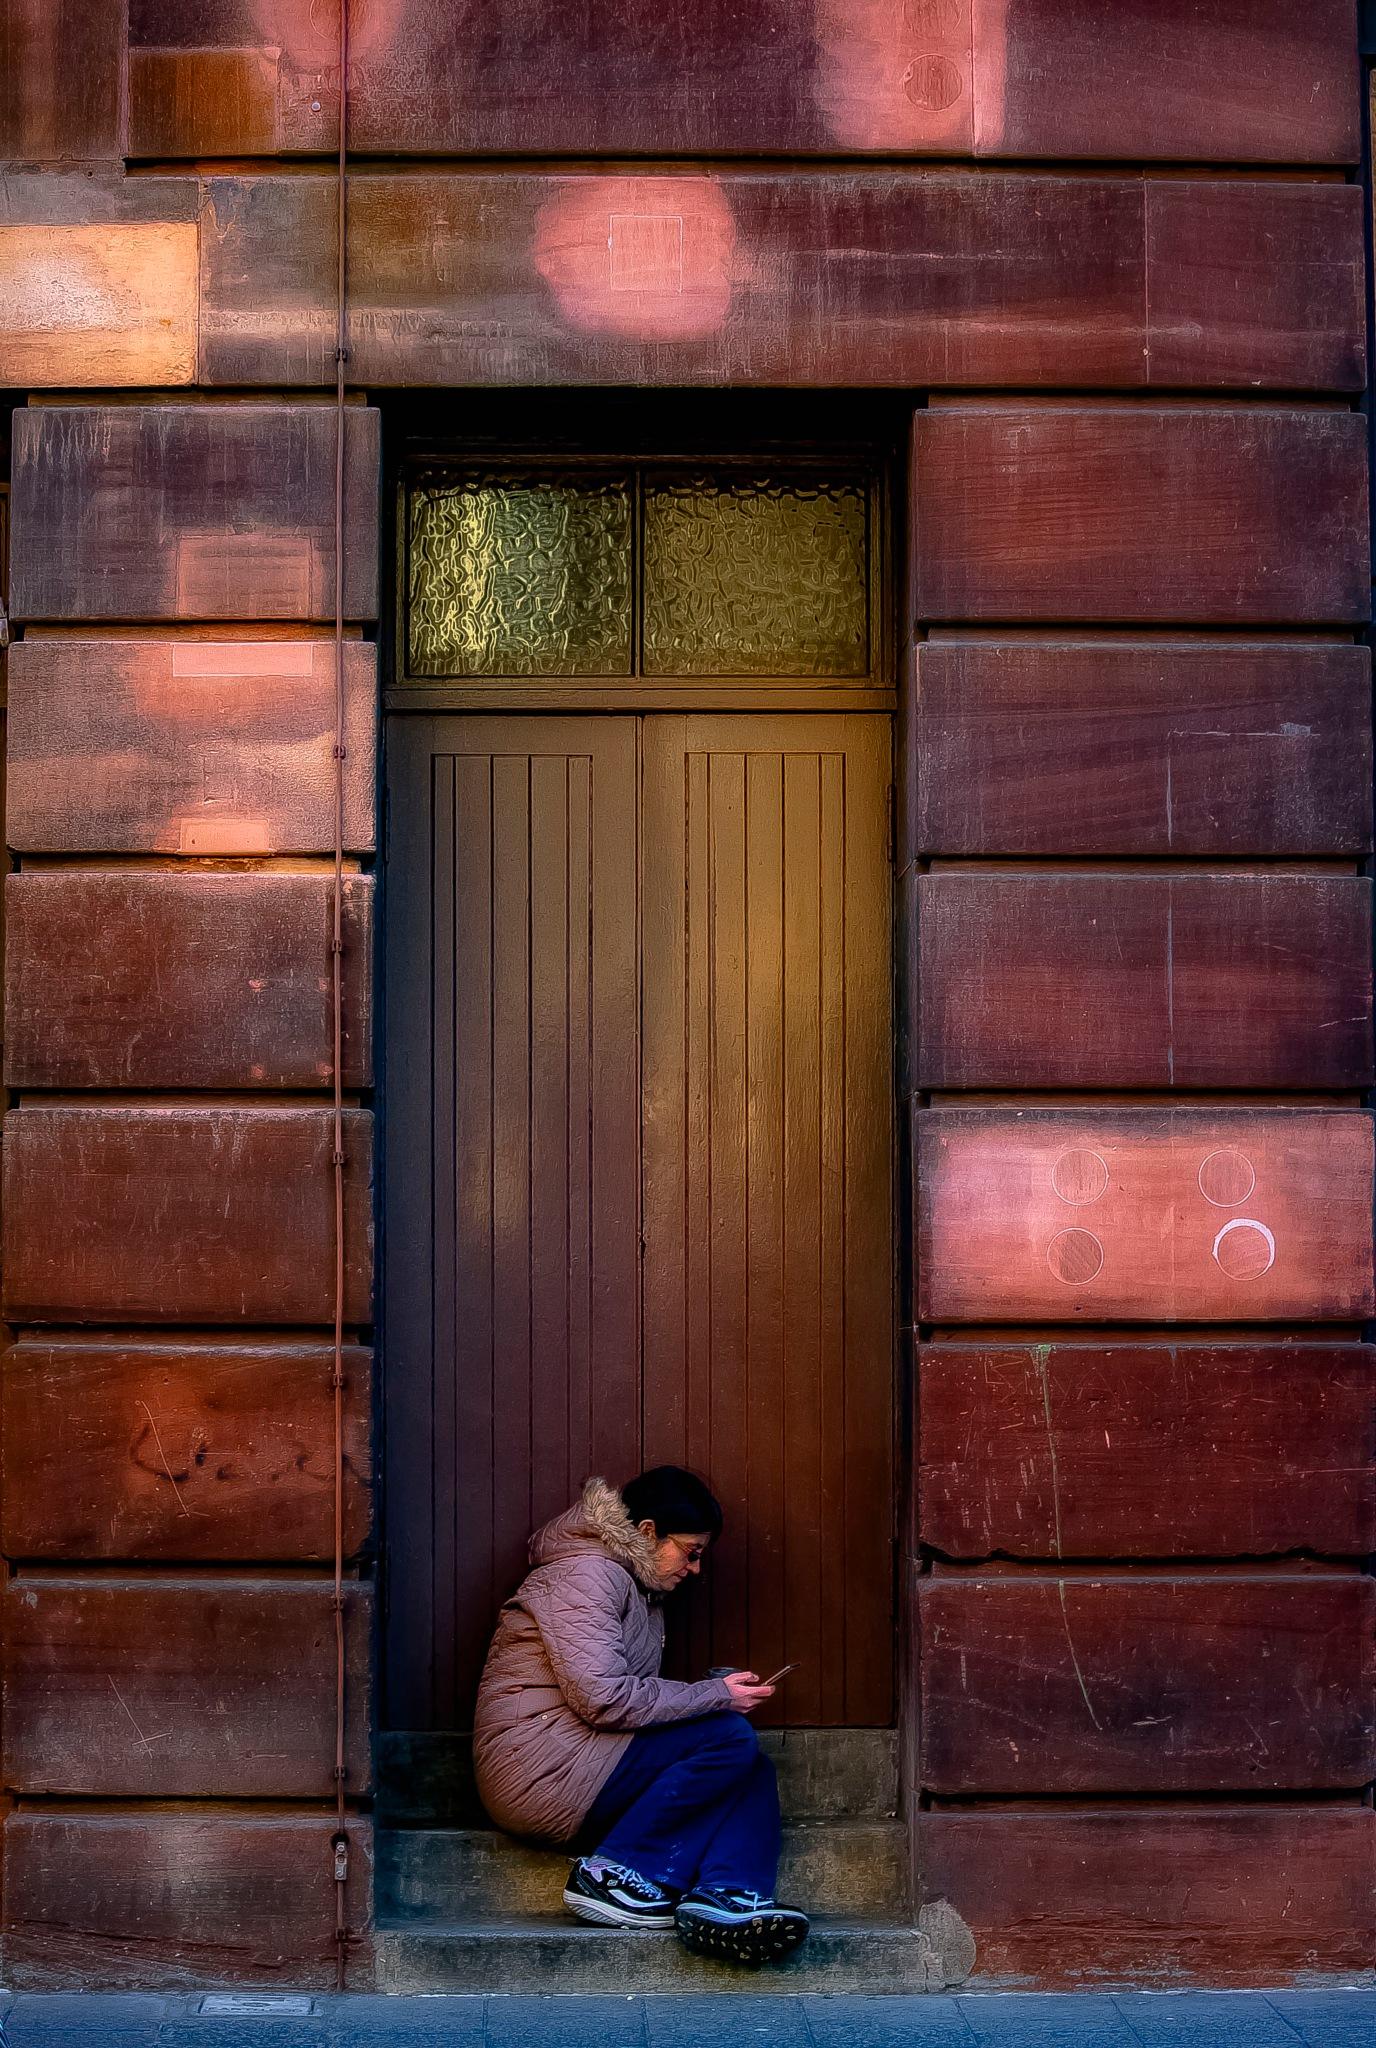 Doorway Edinburgh by michaelheard1962